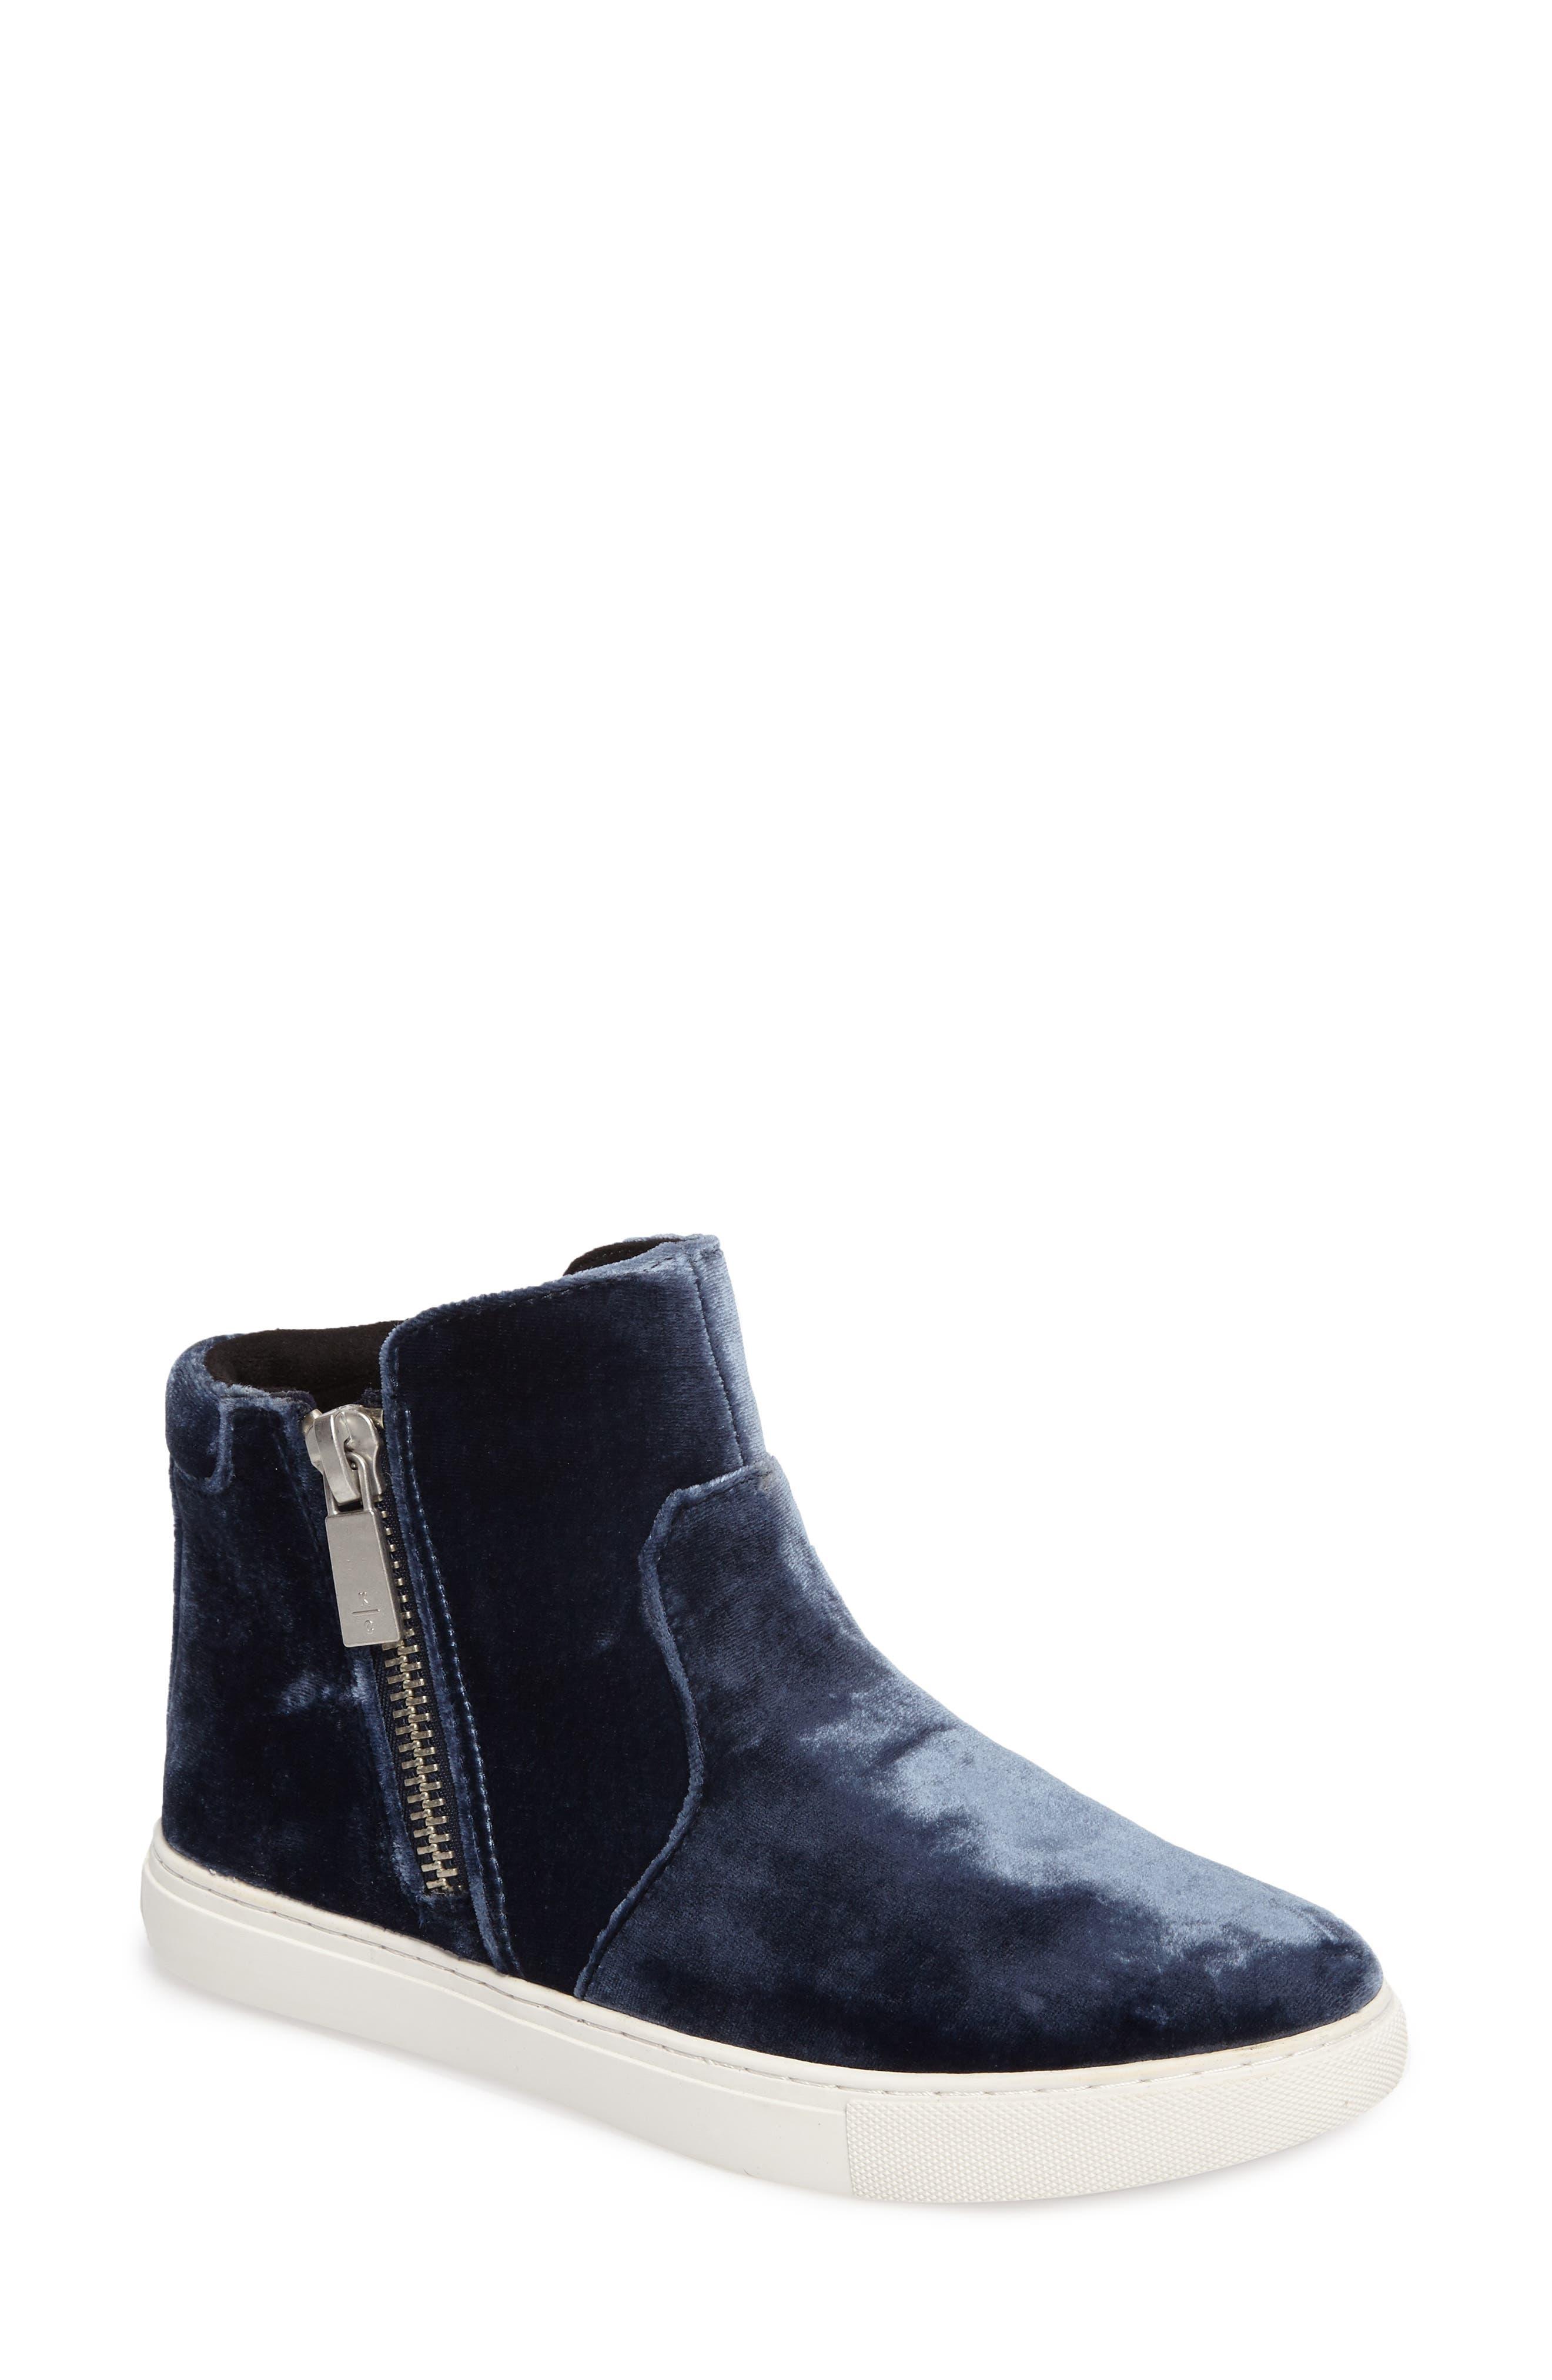 Main Image - Kenneth Cole New York 'Kiera' Zip High Top Sneaker (Women)